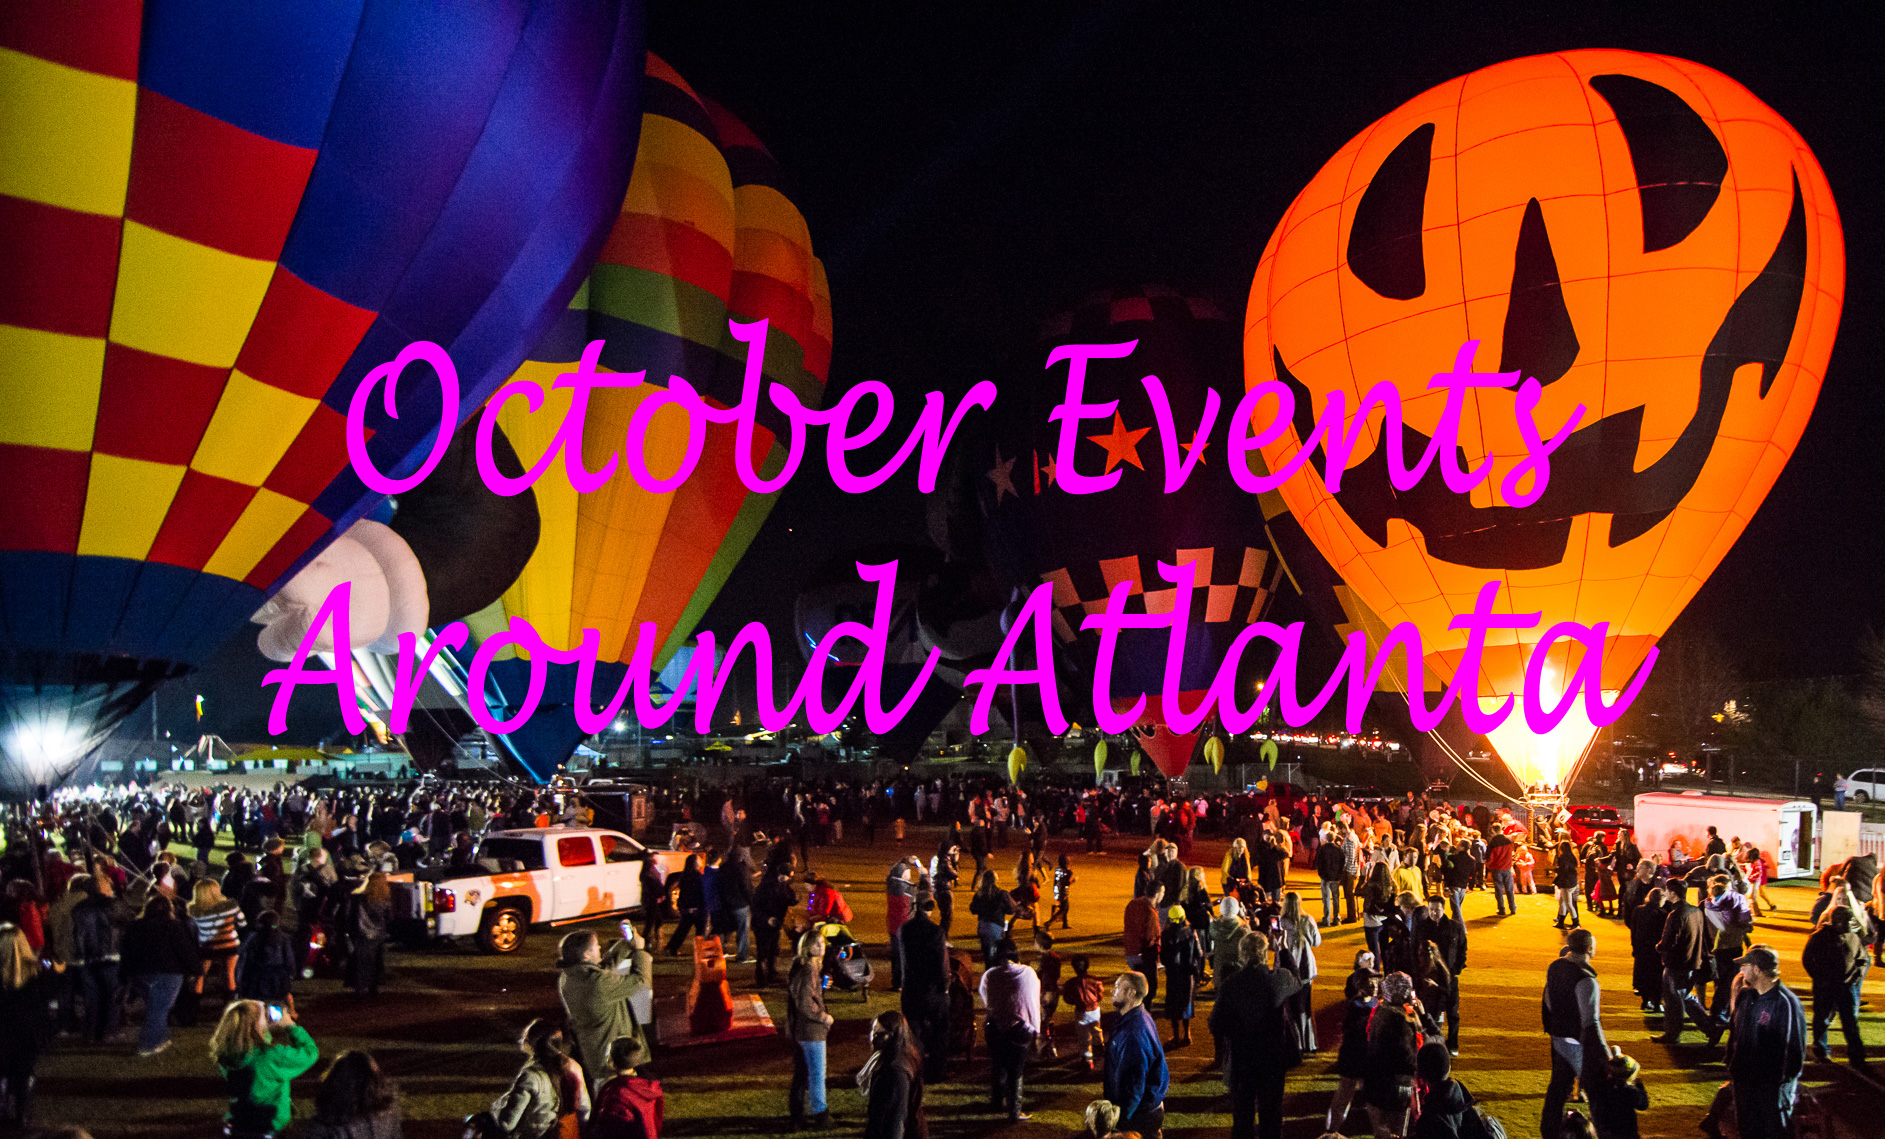 October Events Around Atlanta 2019